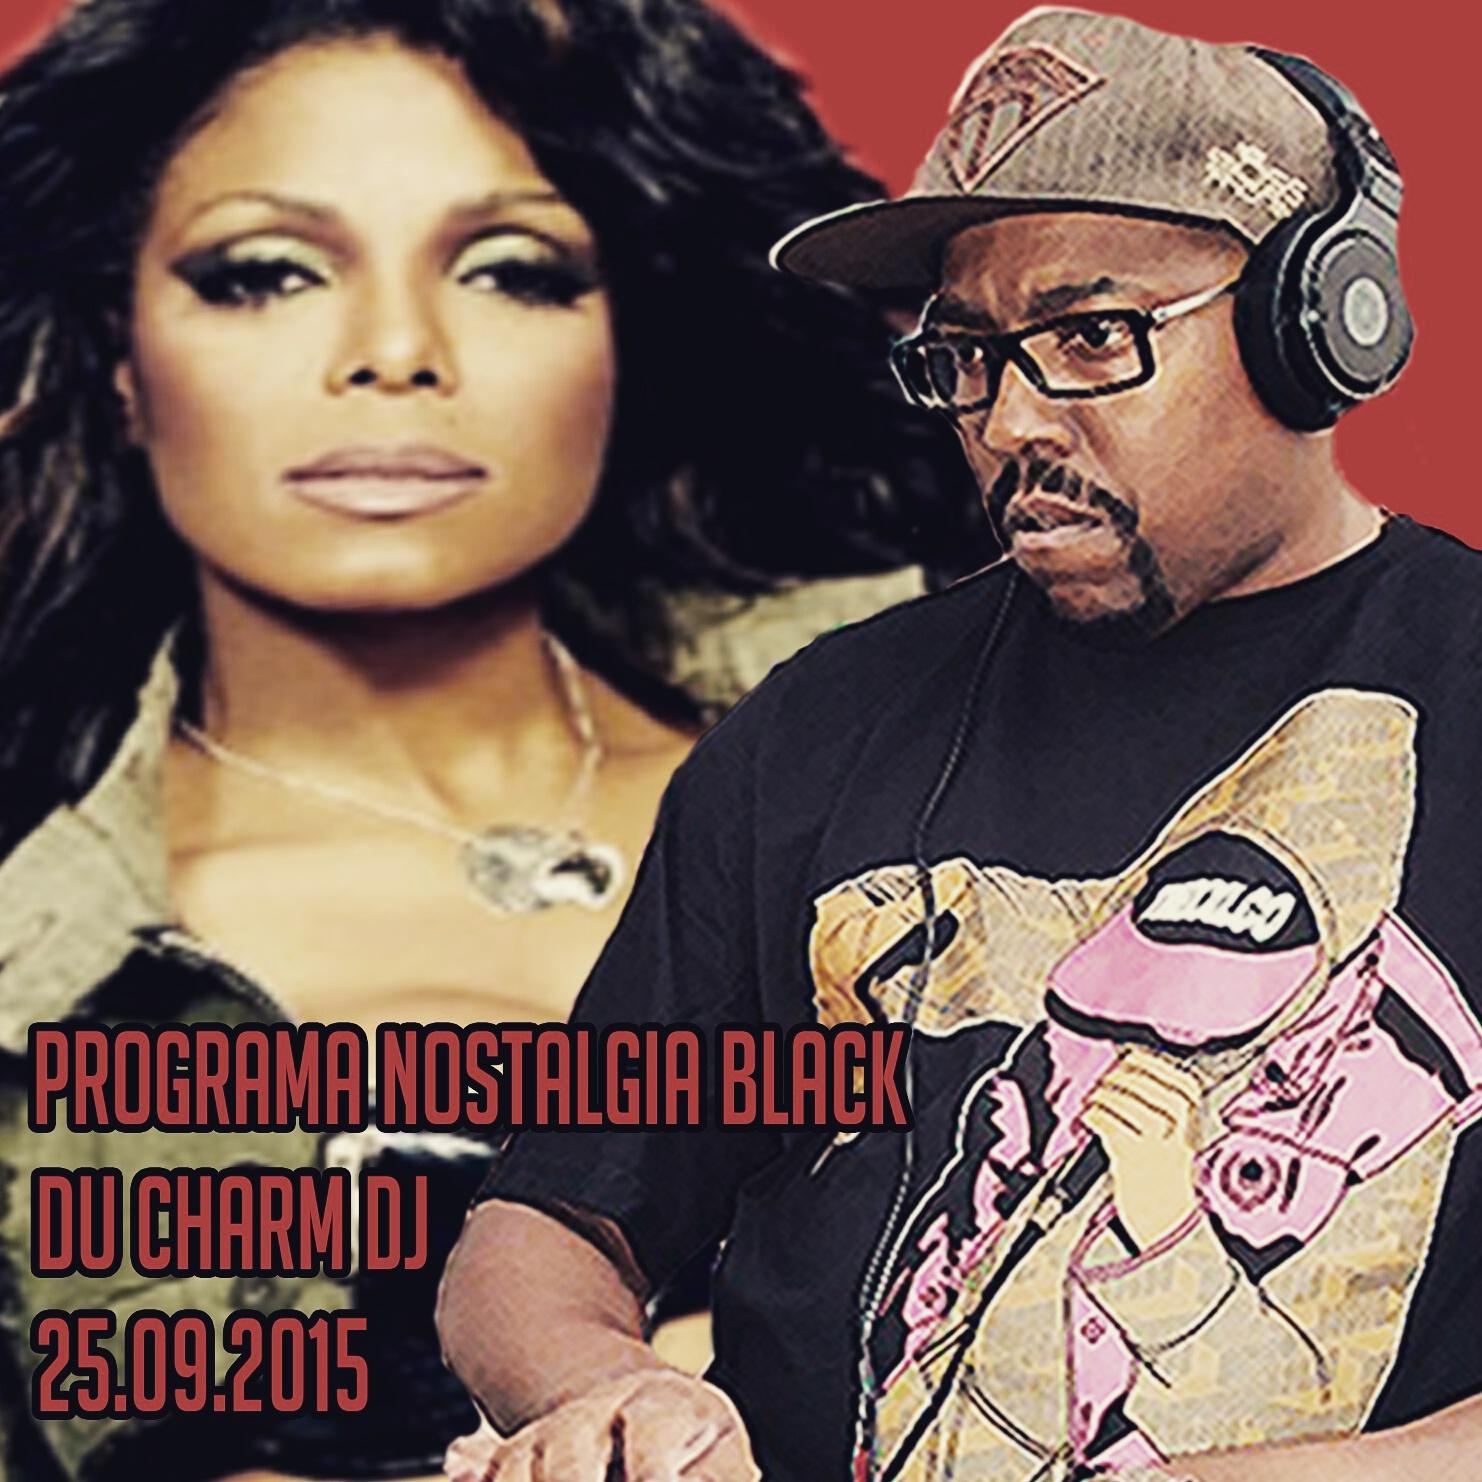 Programa Nostalgia Black Balada Black Du Charm Dj 25